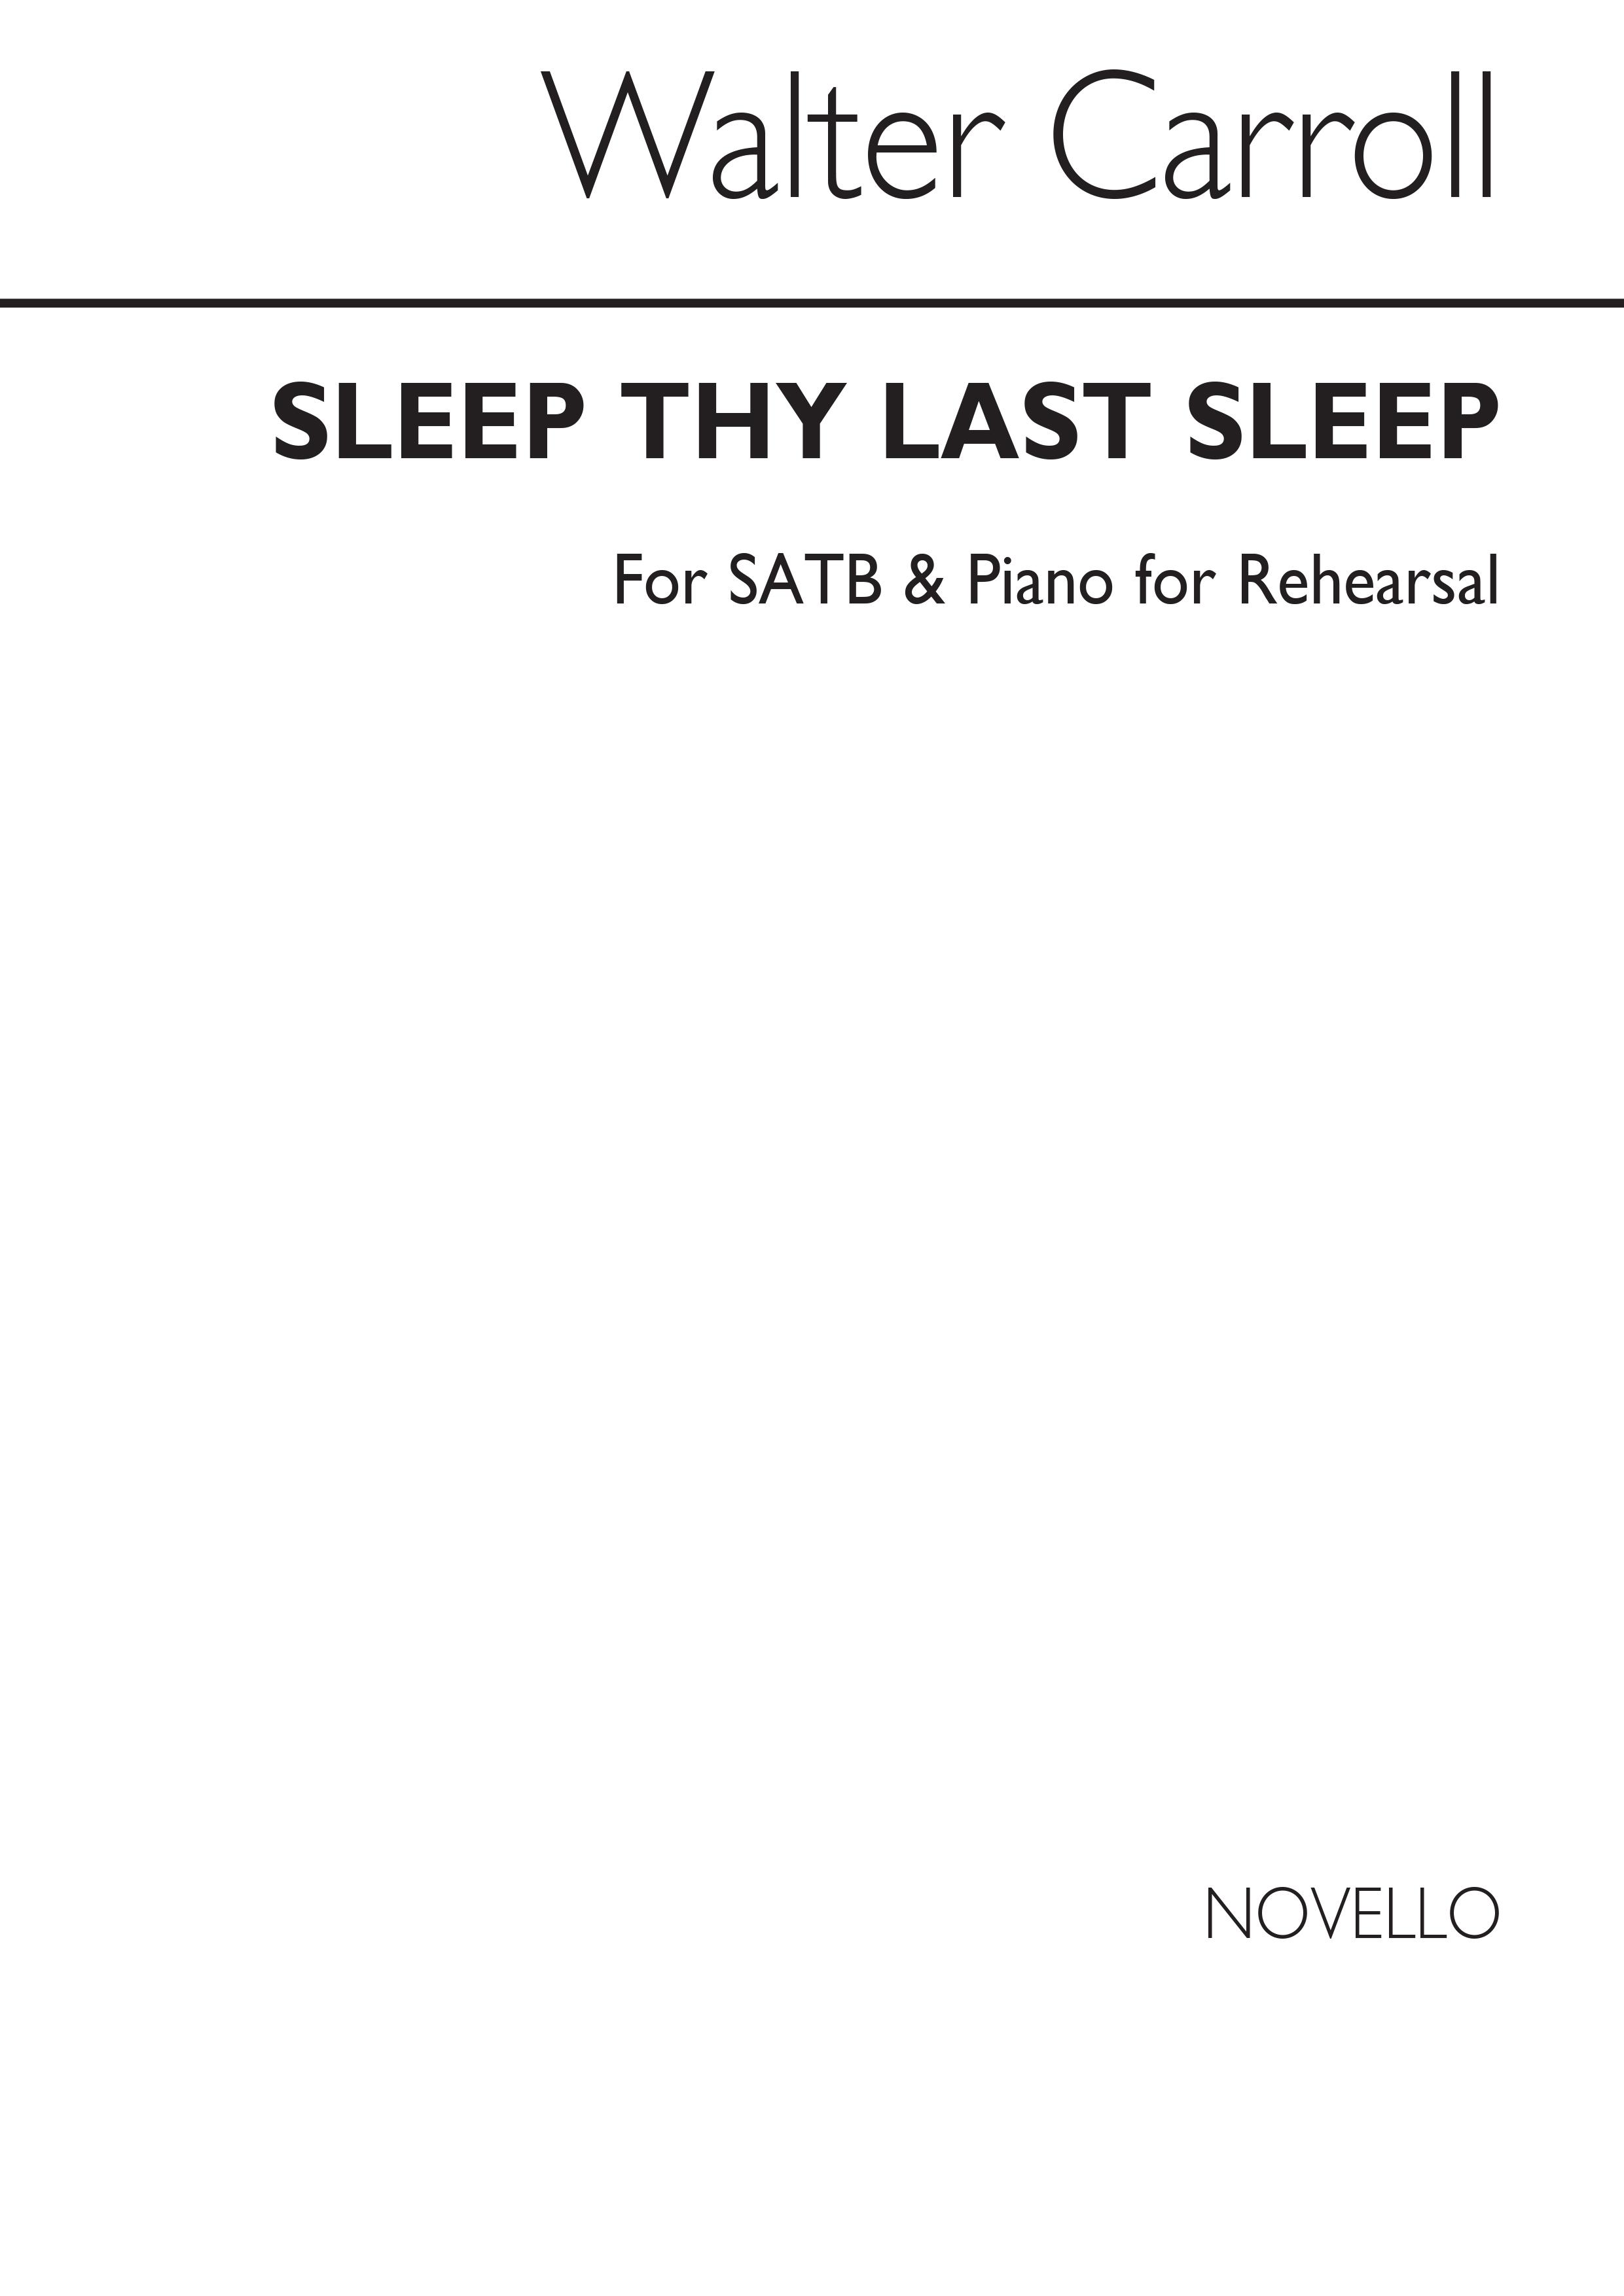 Walter Carroll: W Sleep Thy Last Sleep (For Rehearsal Only): SATB: Vocal Score